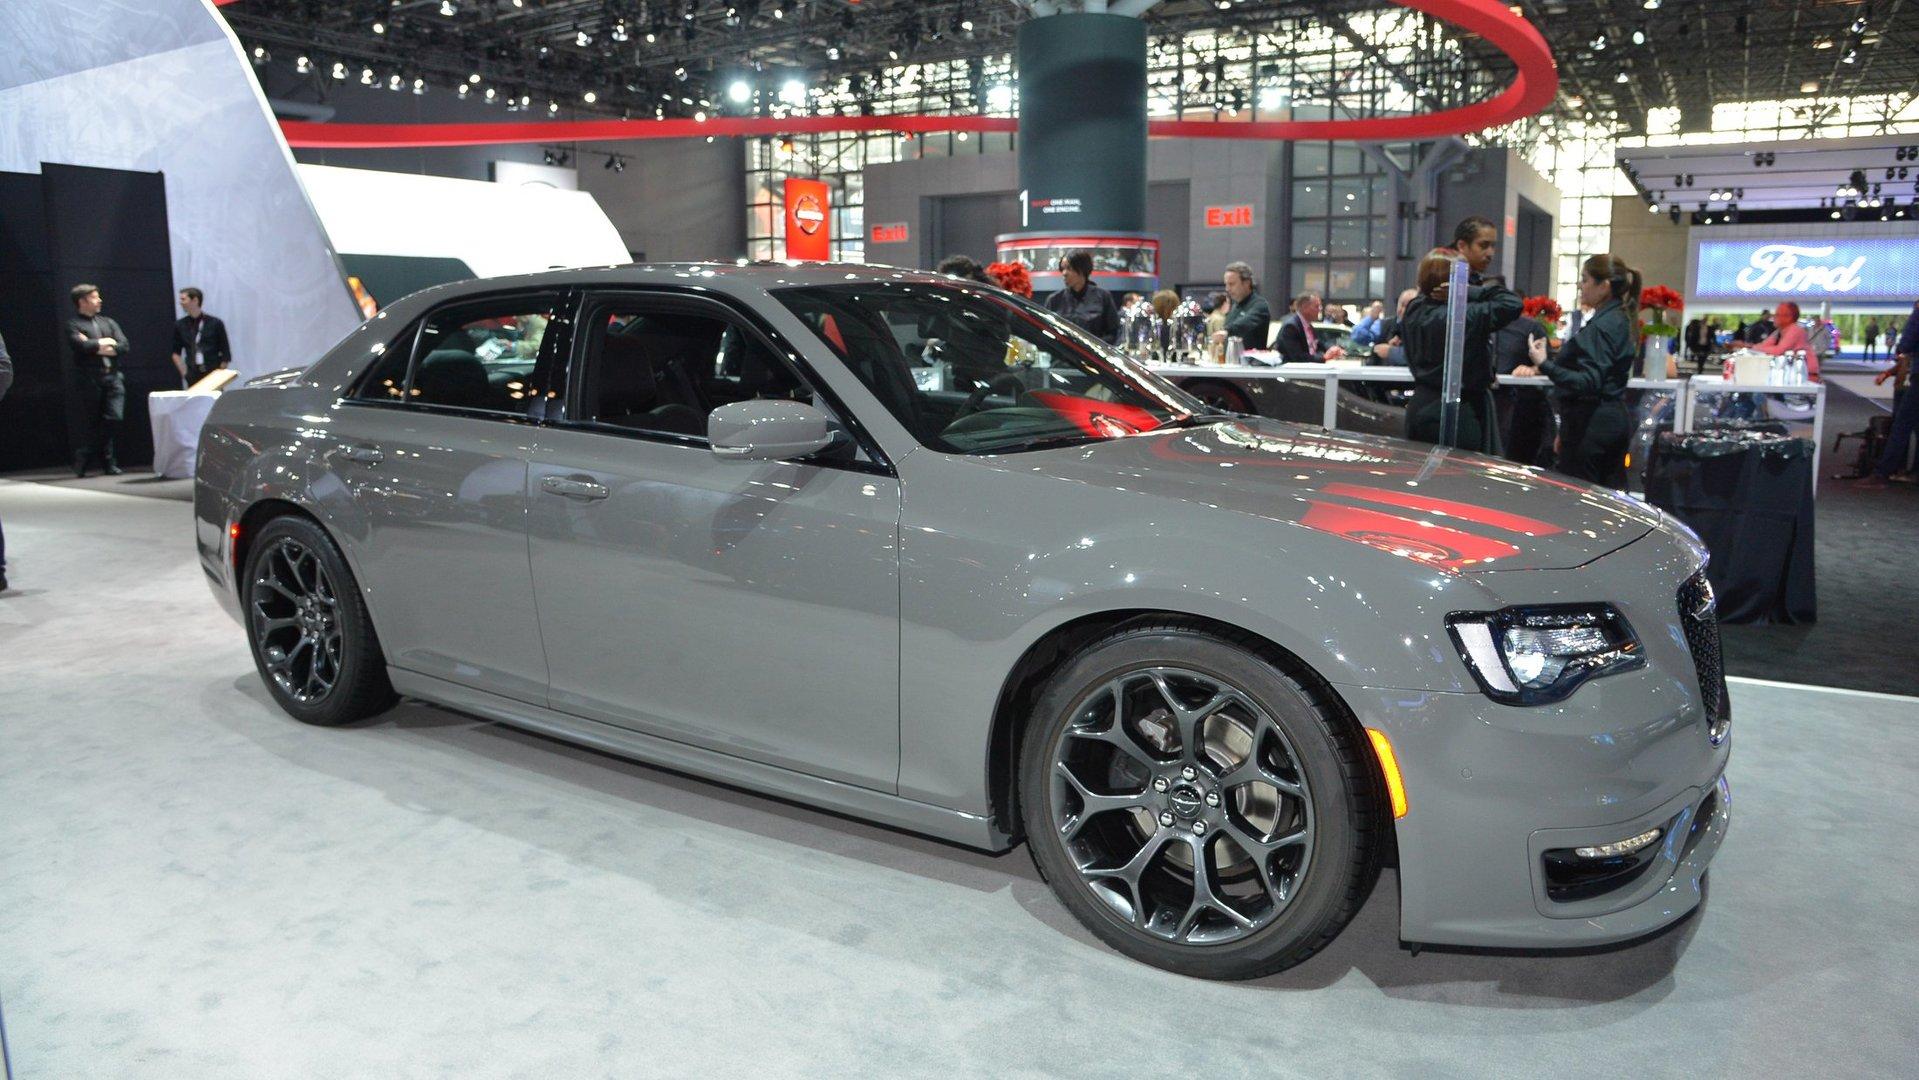 2021 Chrysler 300 Srt8 Redesign and Concept